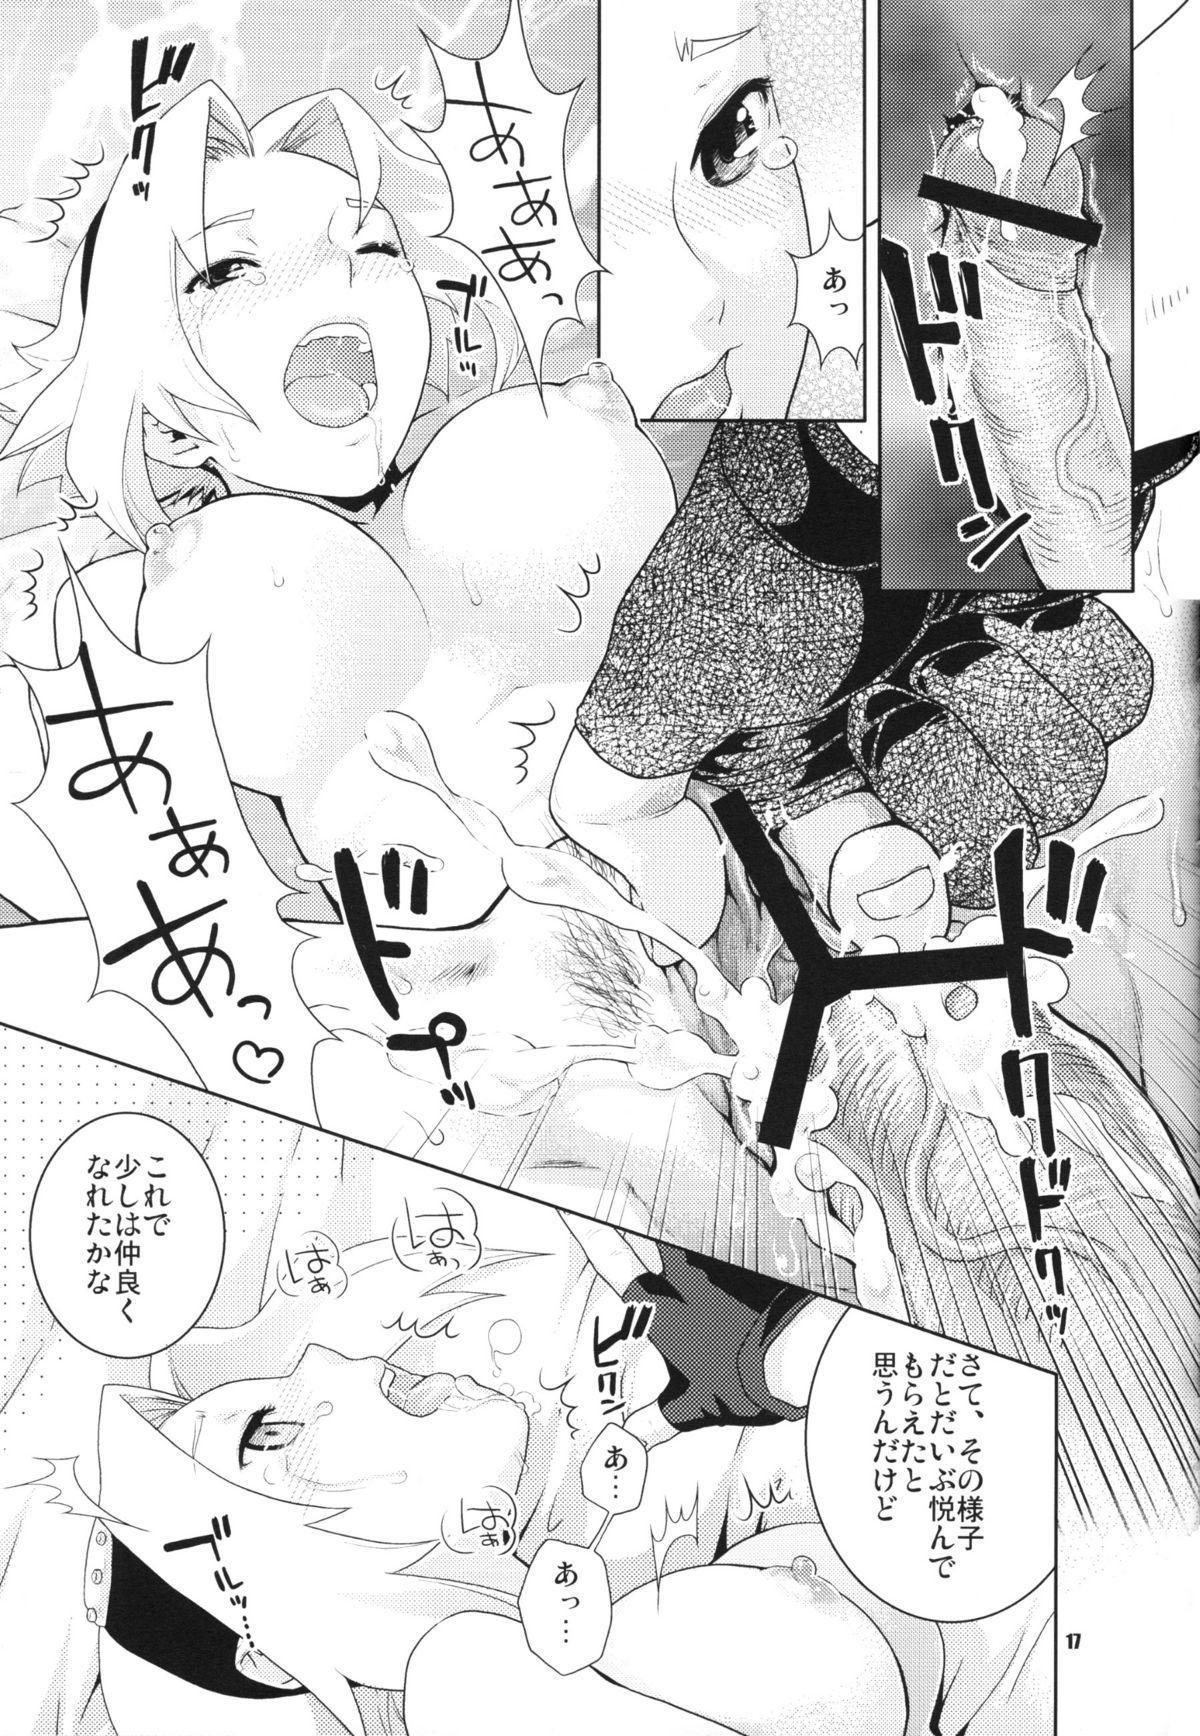 Aya Sakura Emaki 15